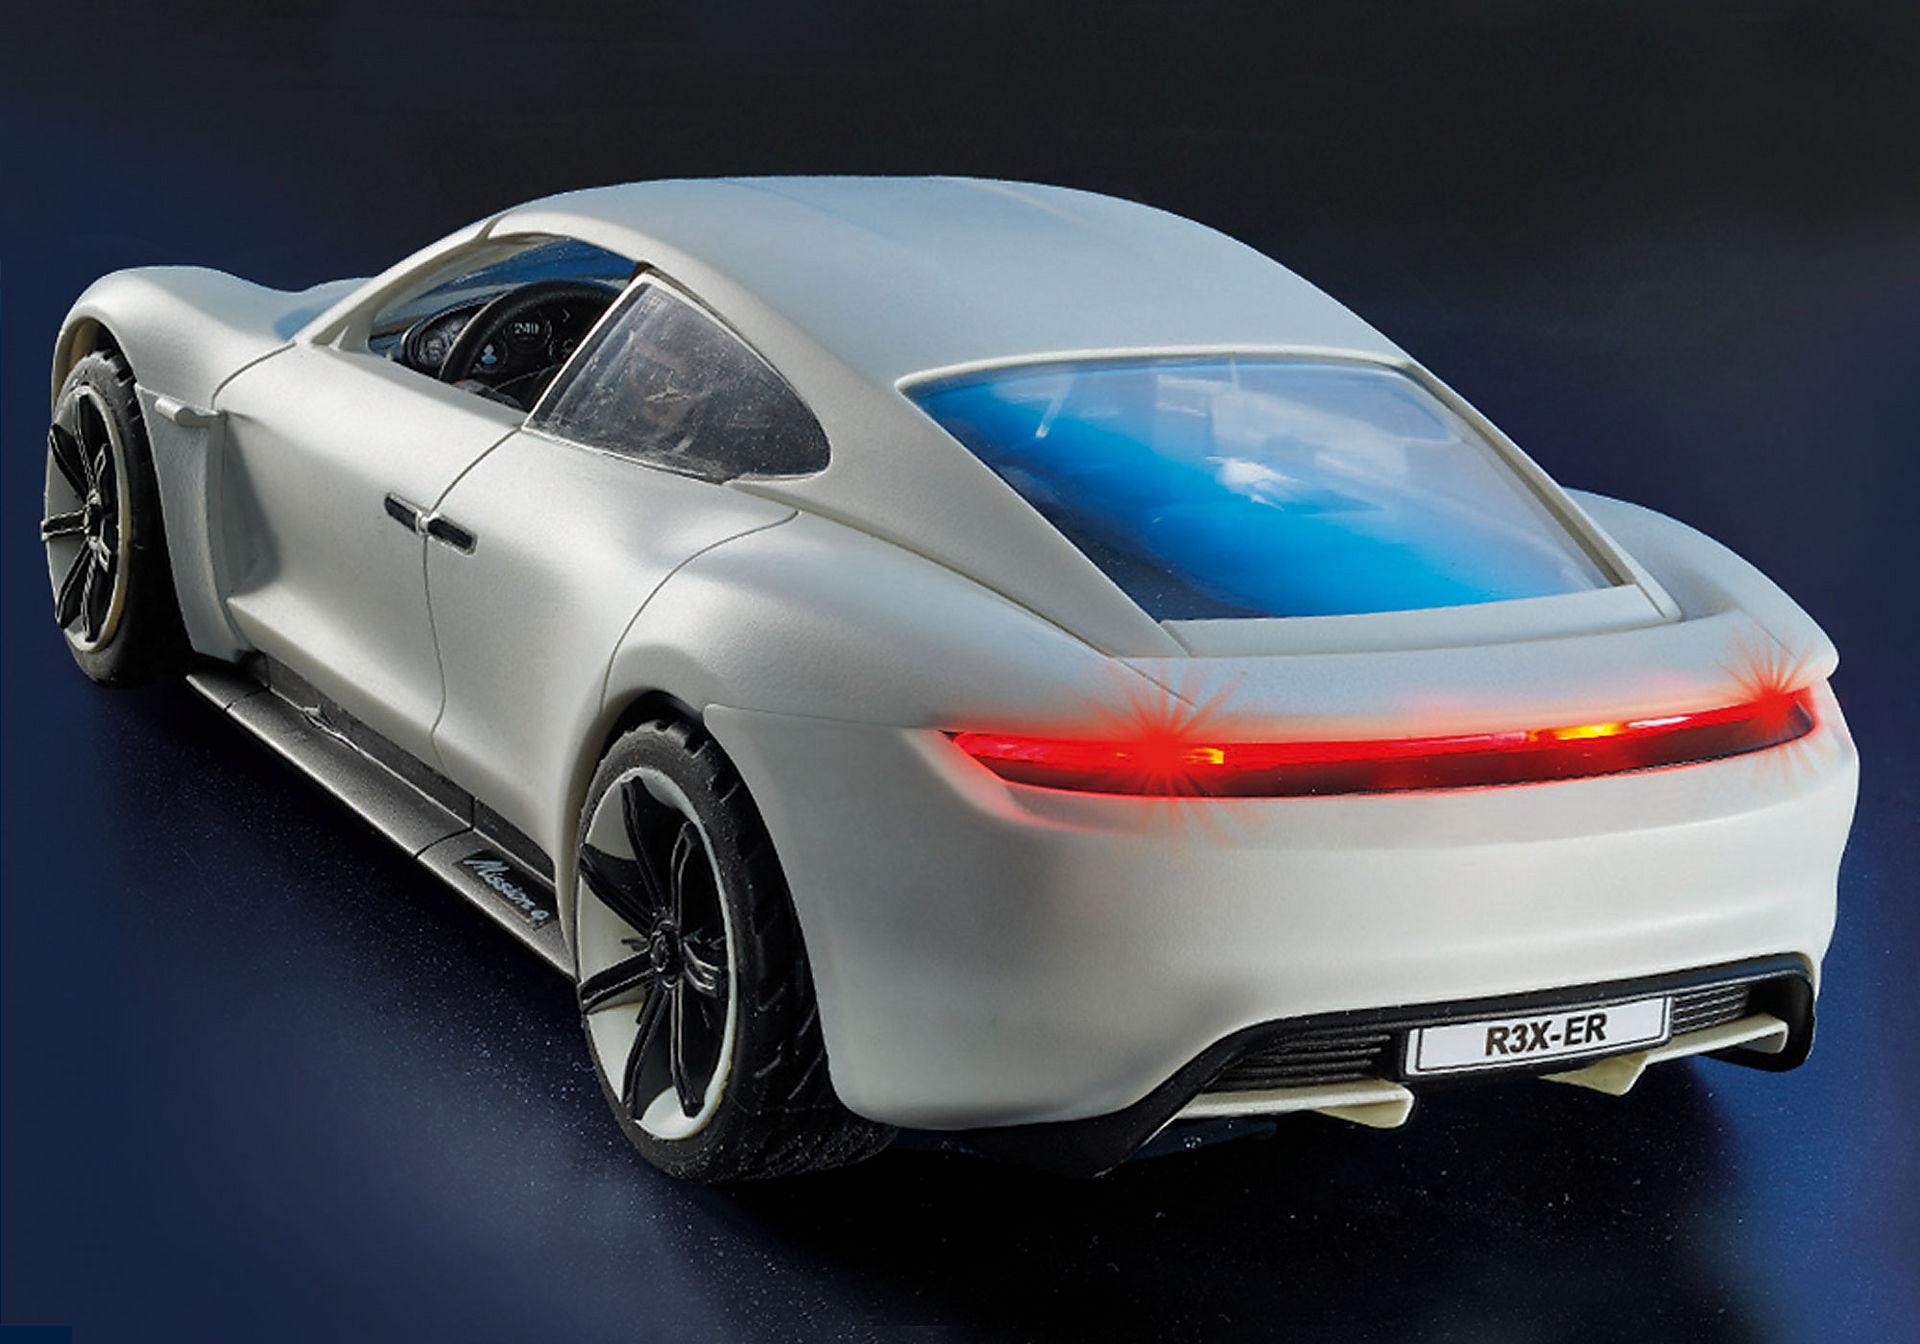 http://media.playmobil.com/i/playmobil/70078_product_extra3/PLAYMOBIL:THE MOVIE Rex Dasher's Porsche Mission E